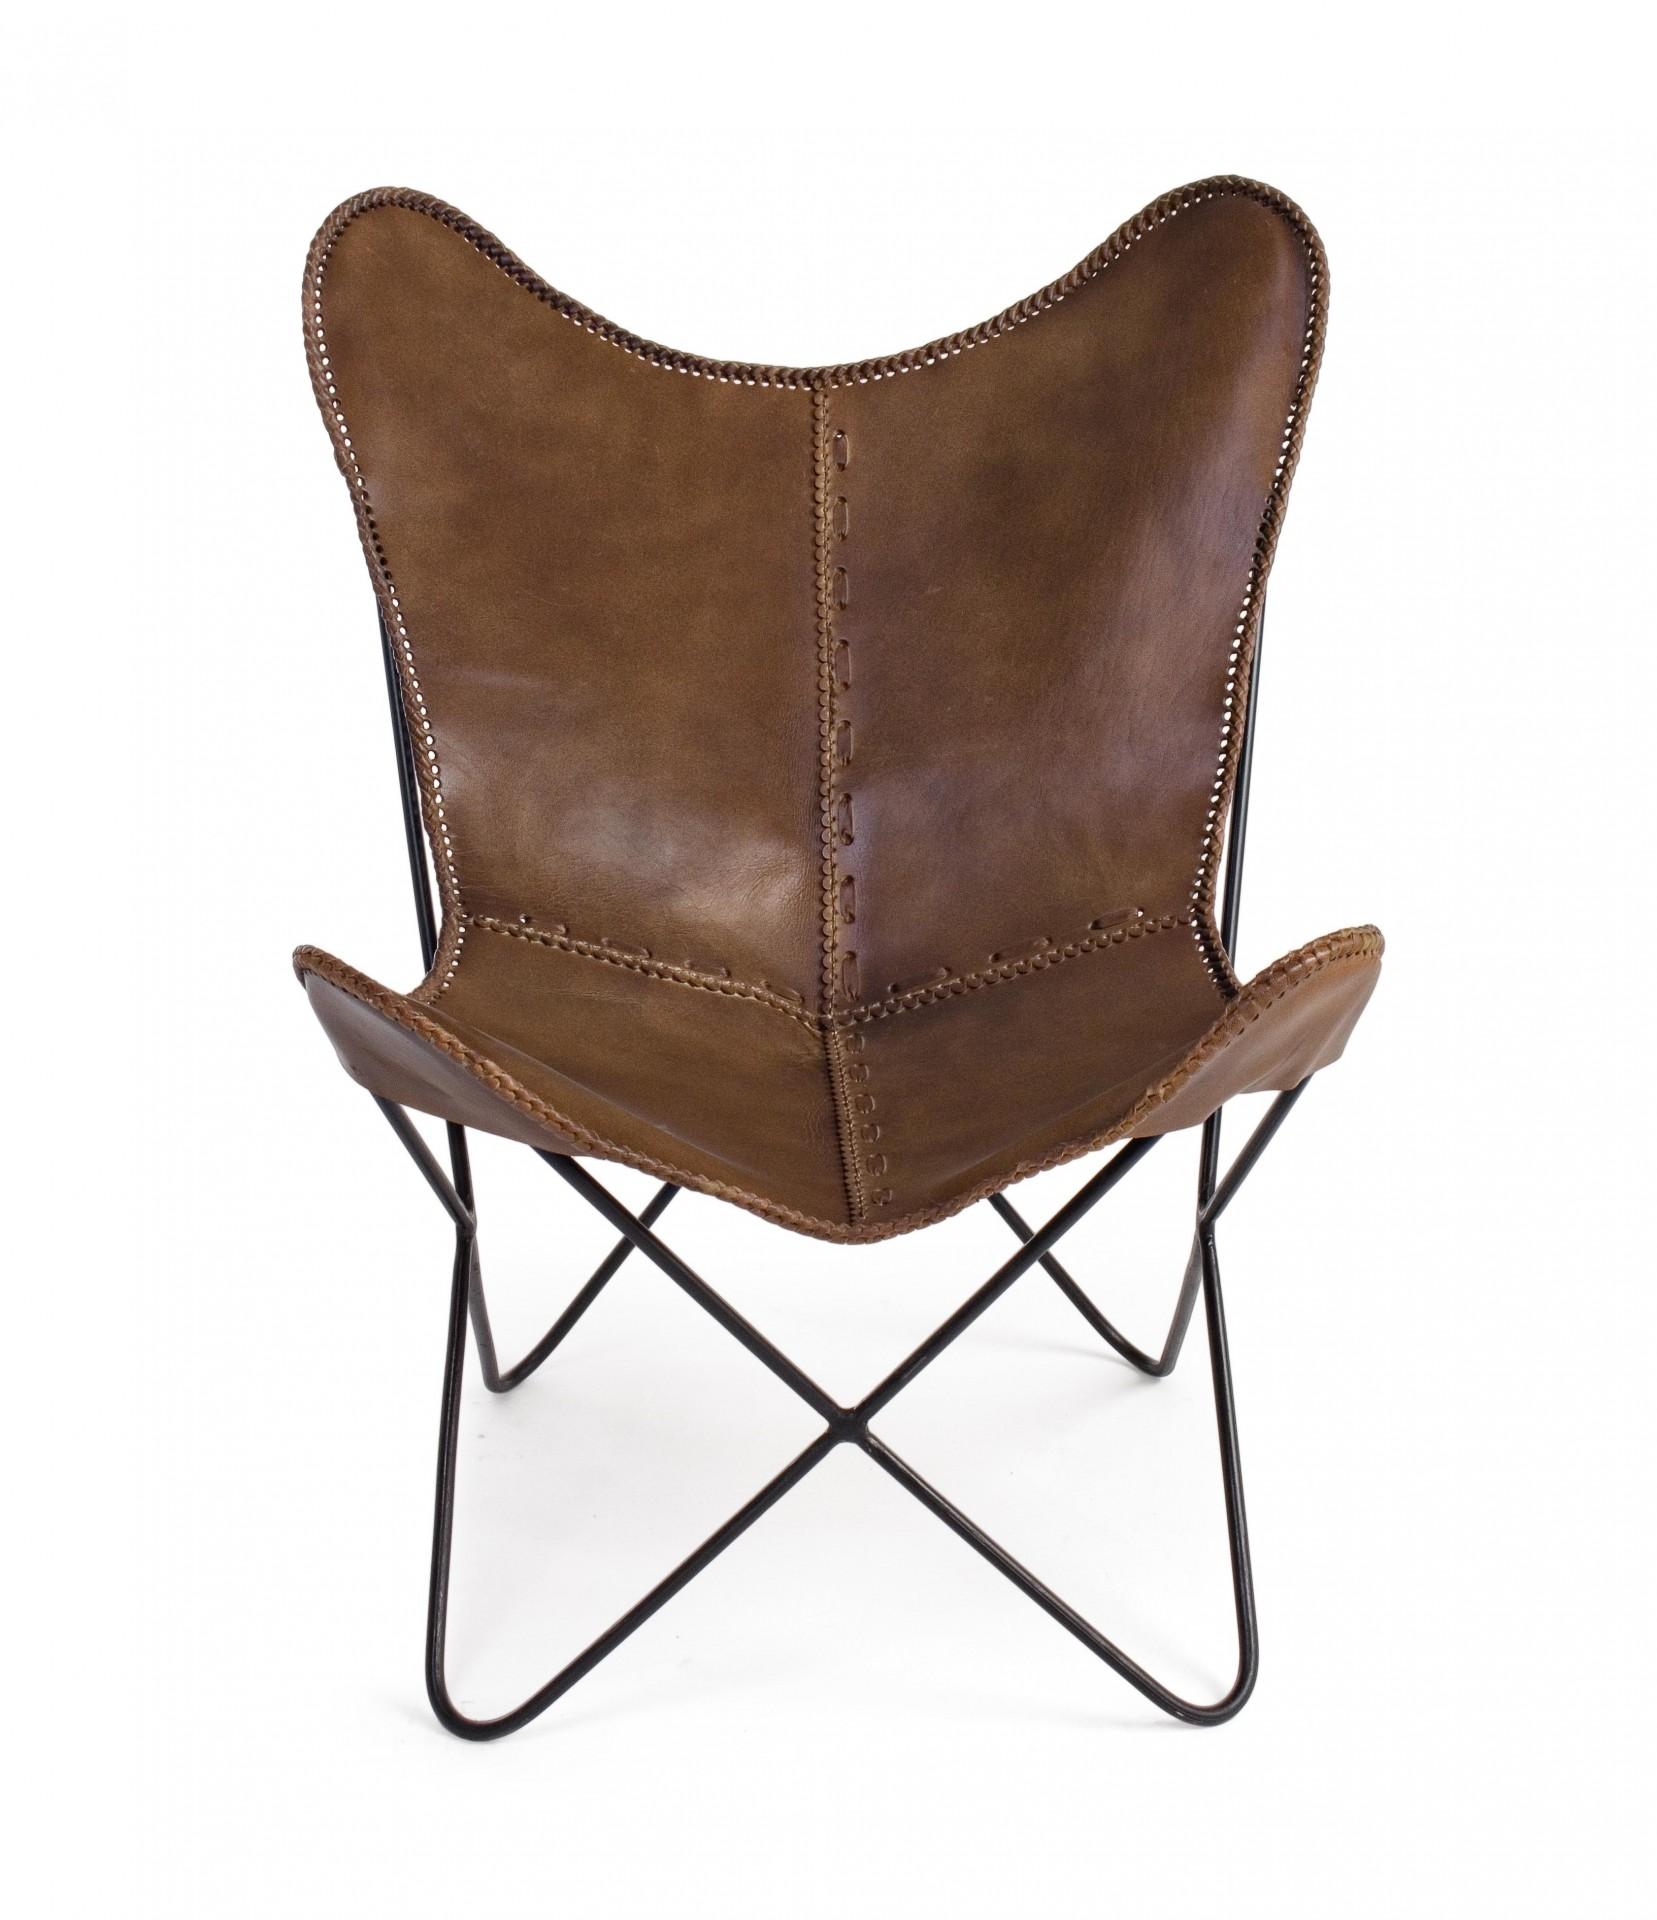 Cadeira Eaton em Couro. Estilo Vintage